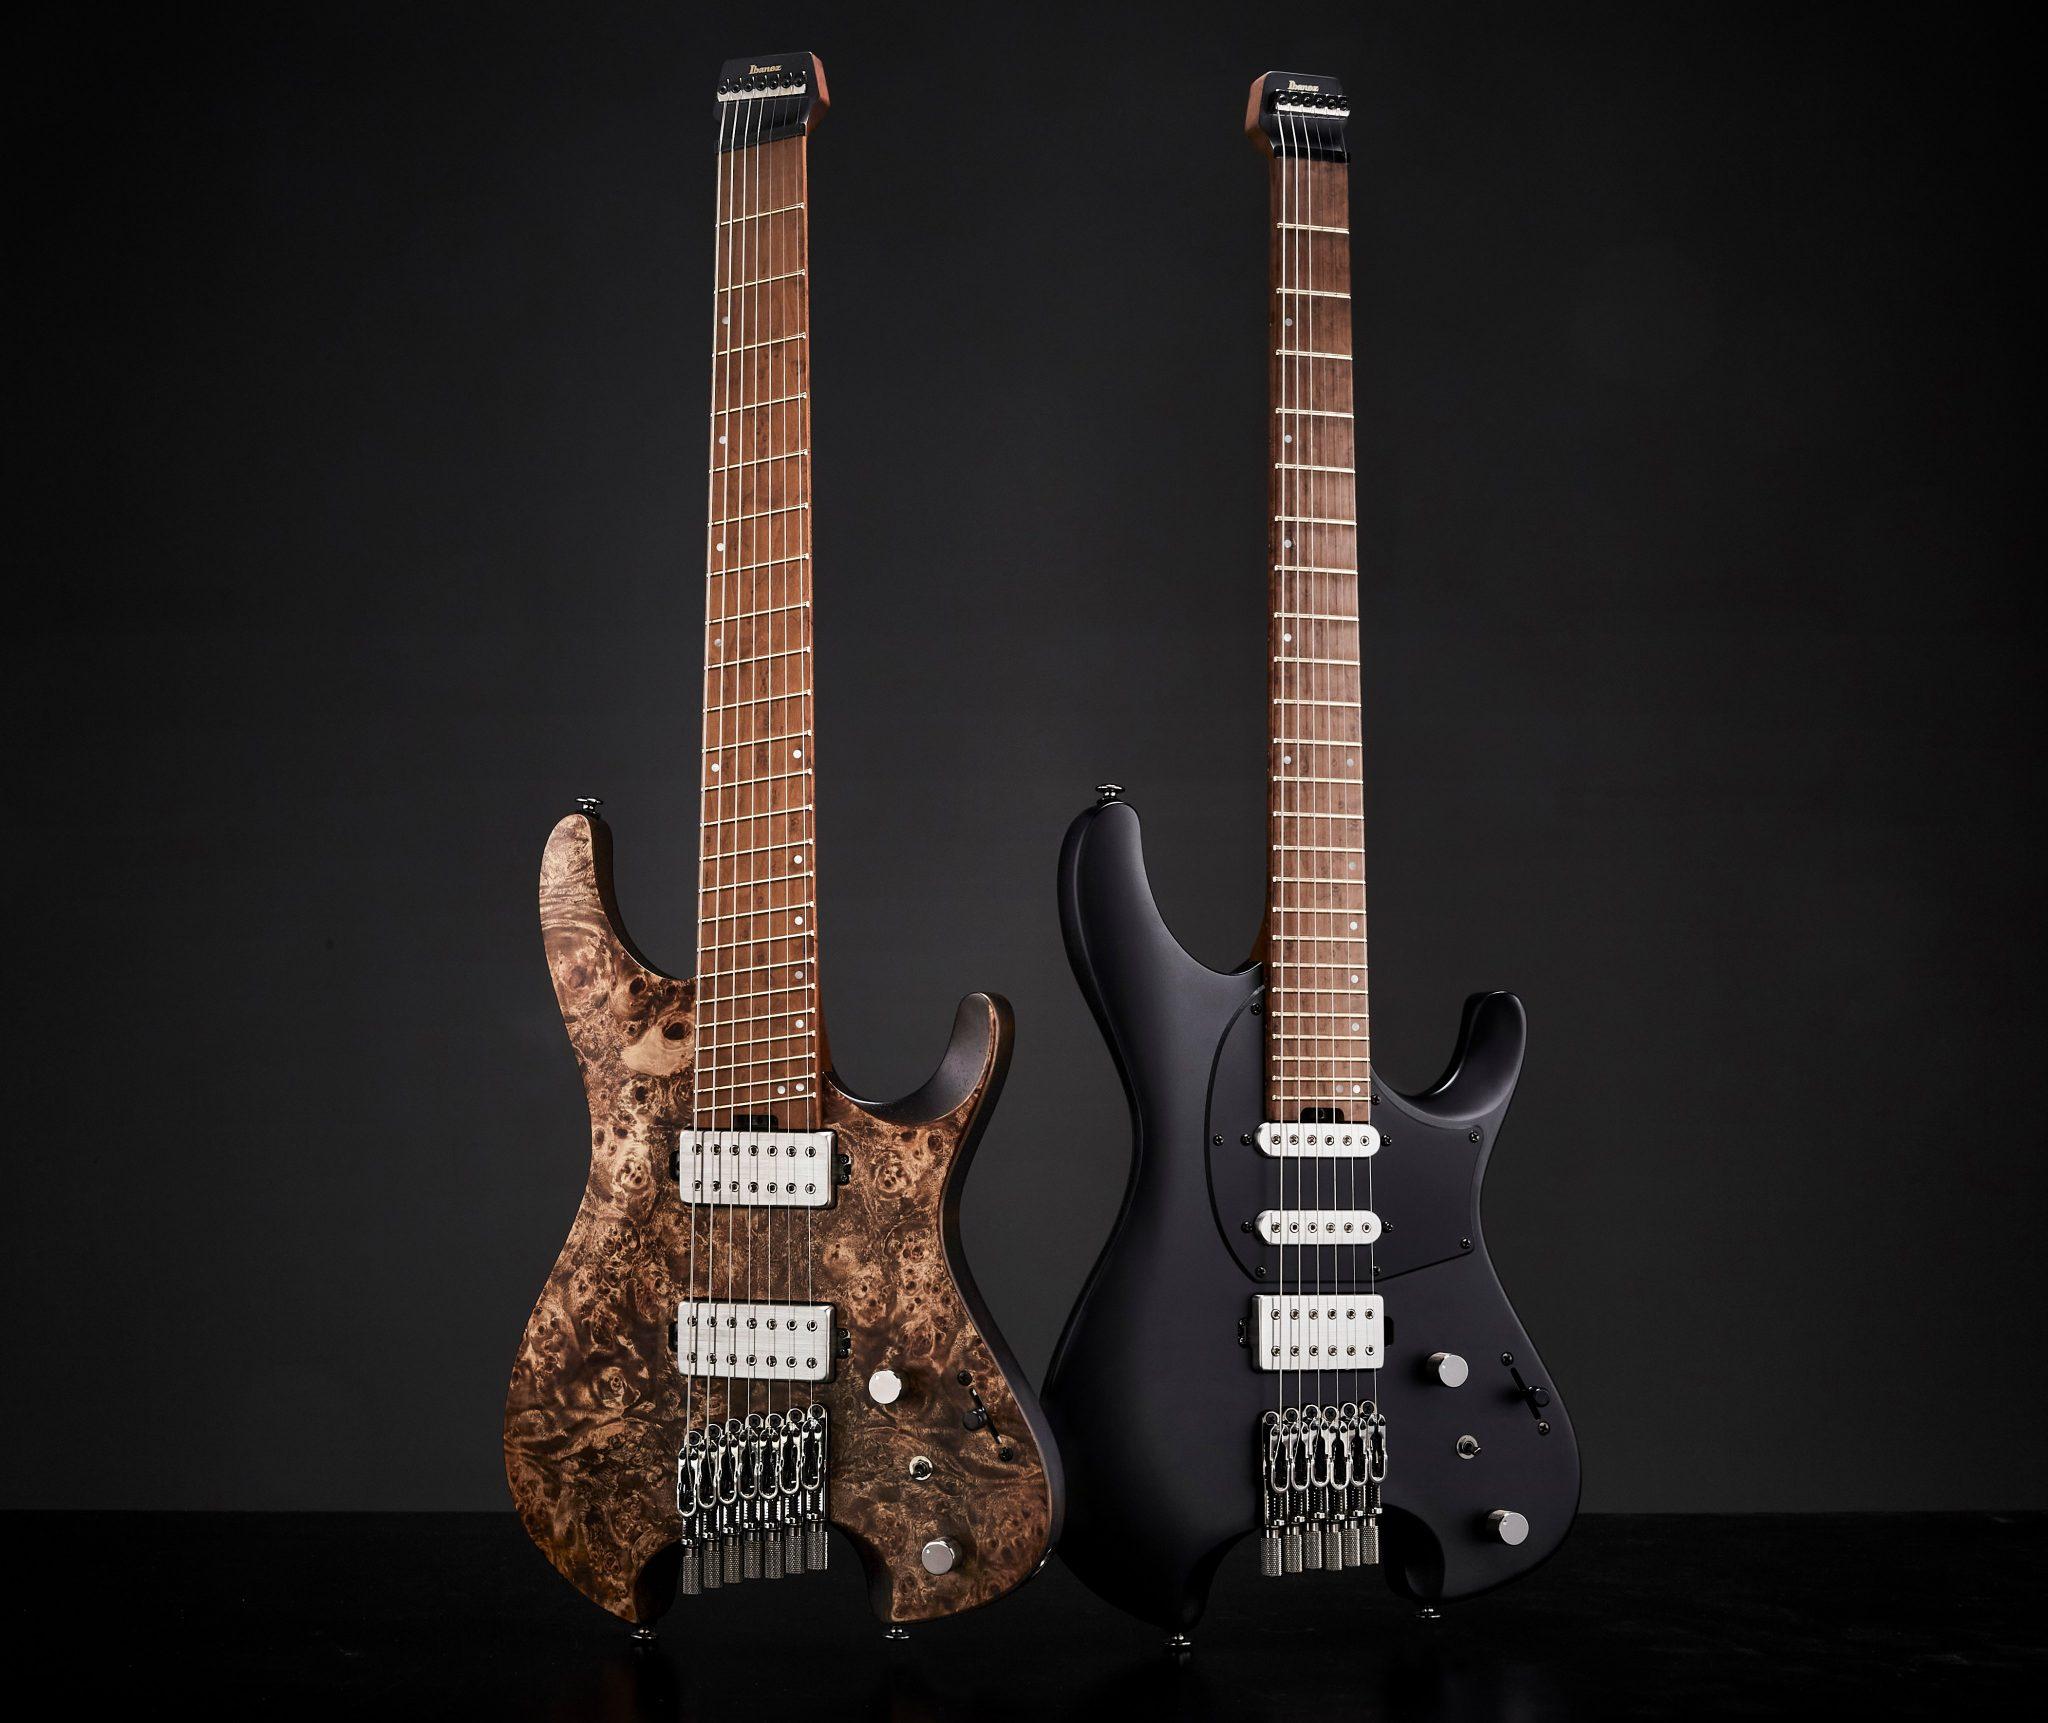 Ibanez guitar headless ICHI 10